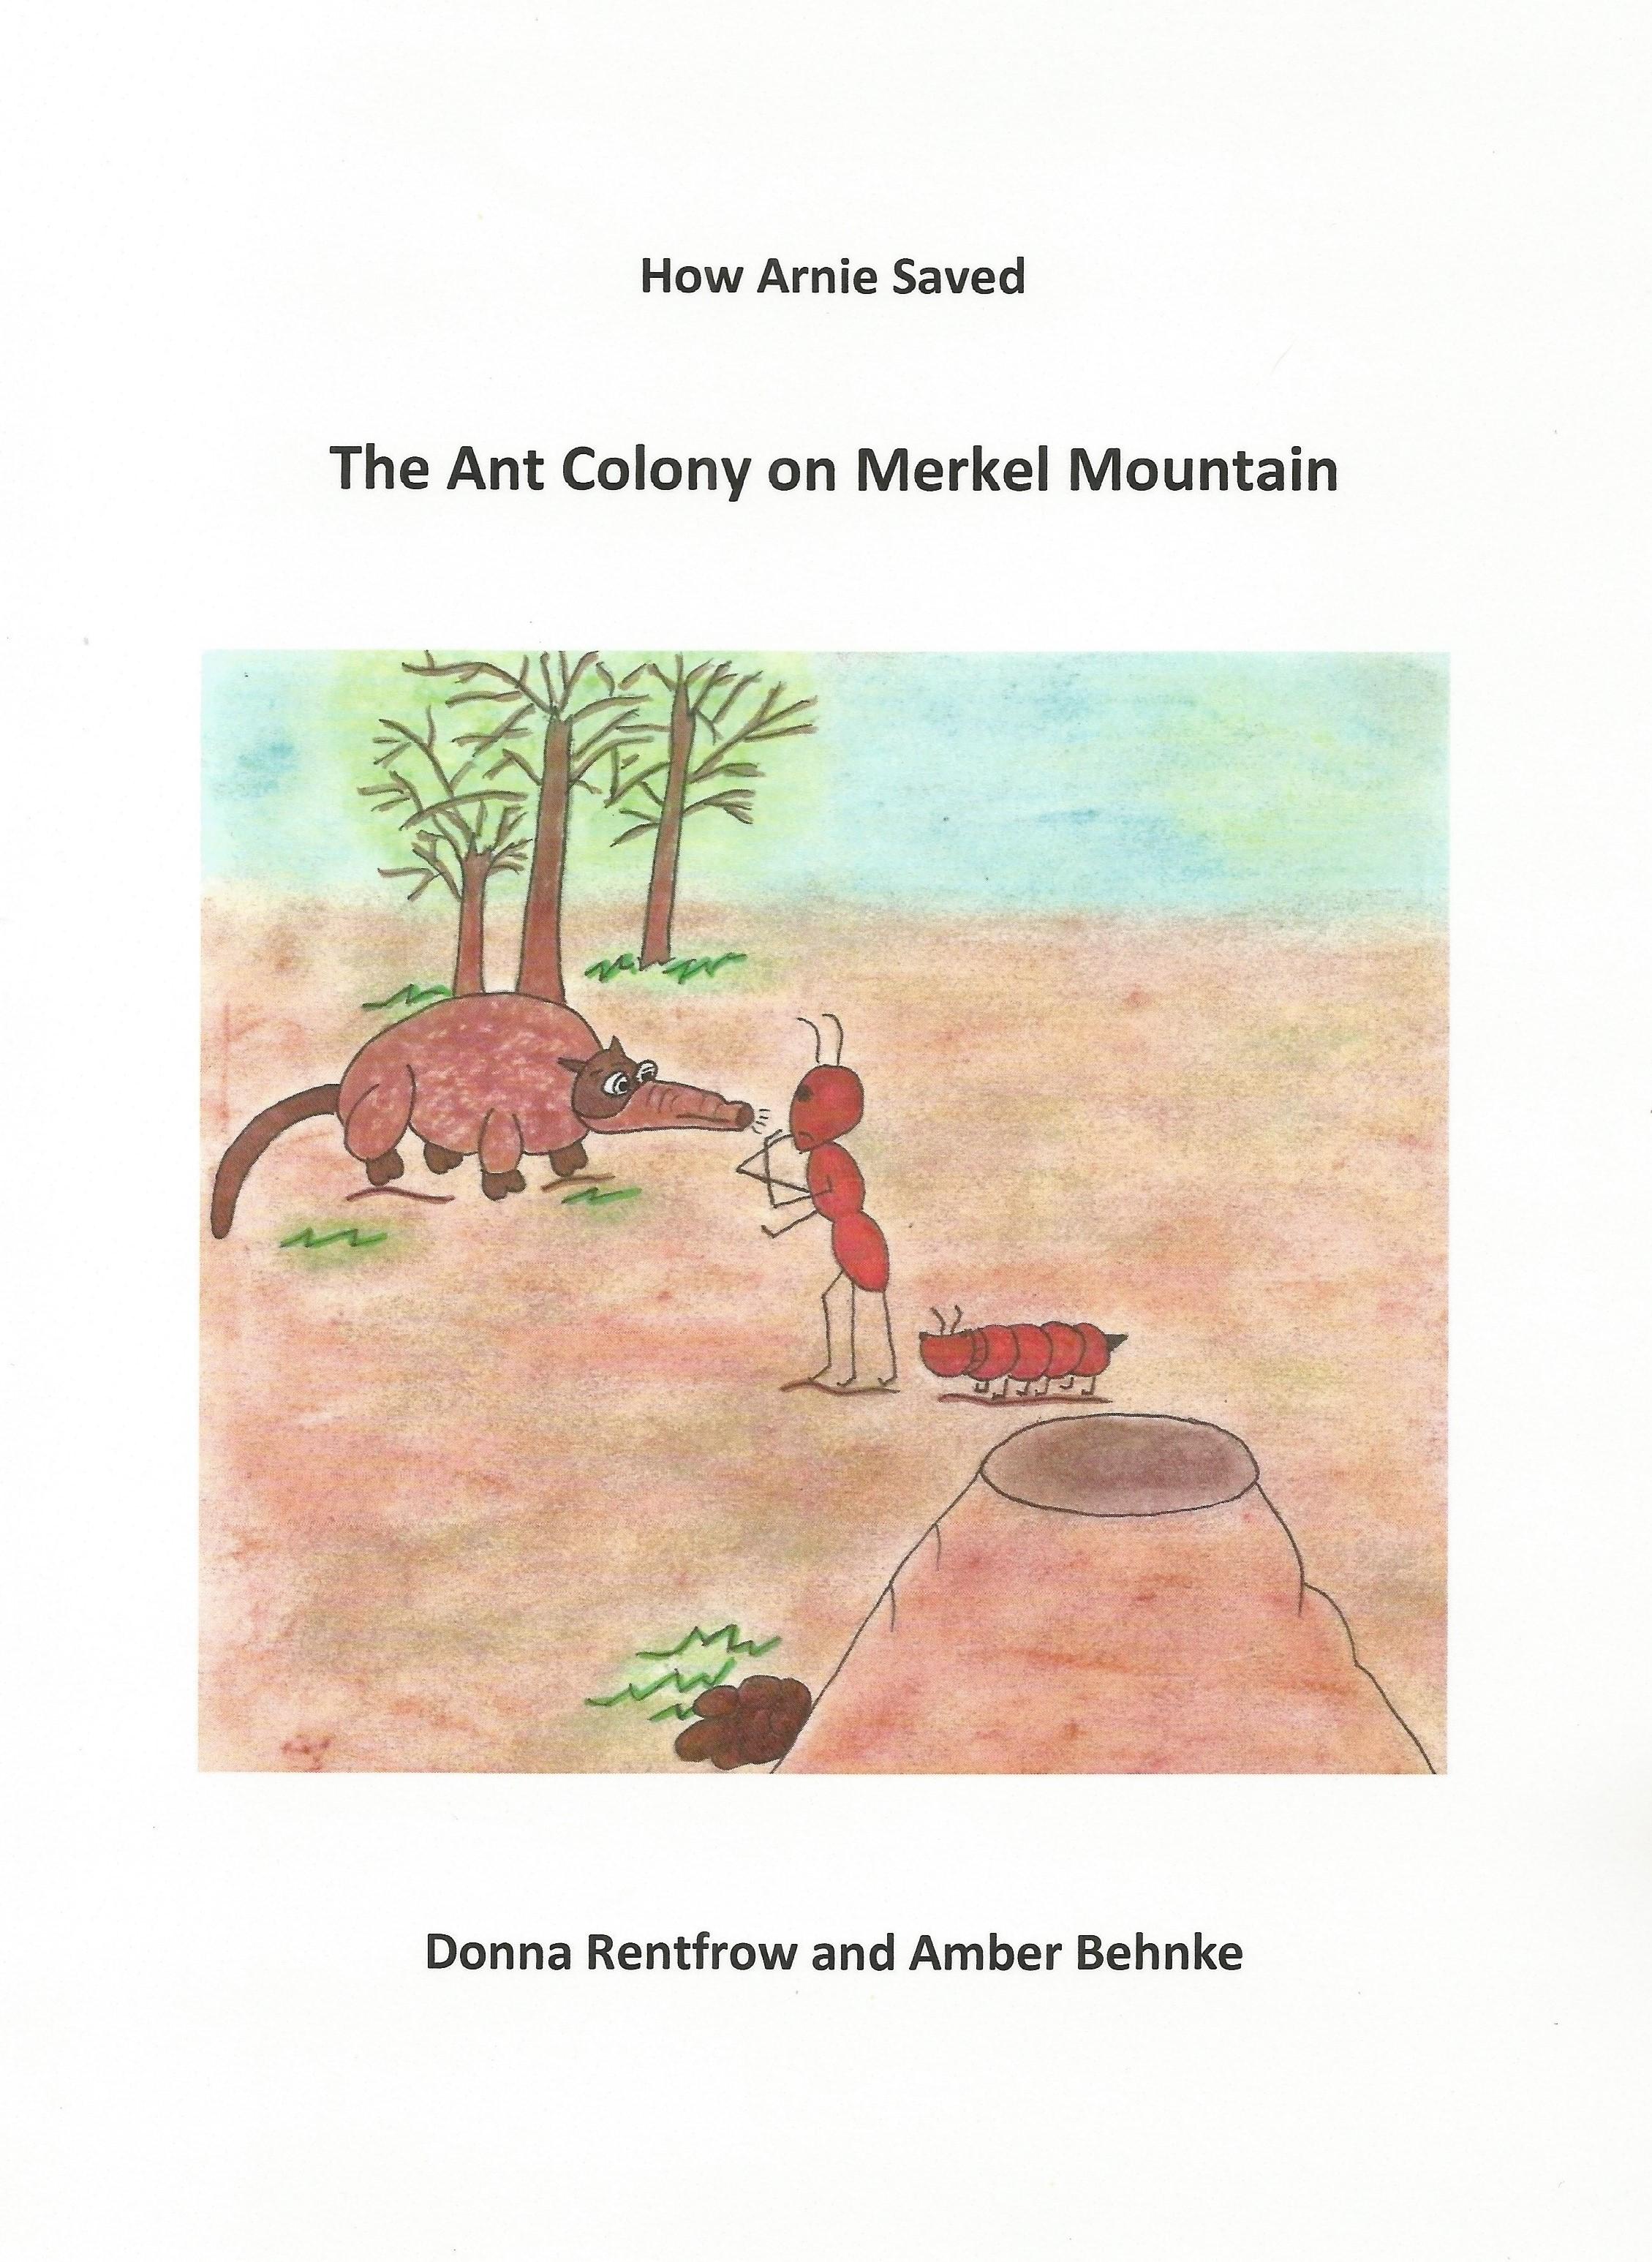 How Arnie Saved the nt Colony on Merkel Mountain's Ebook Image